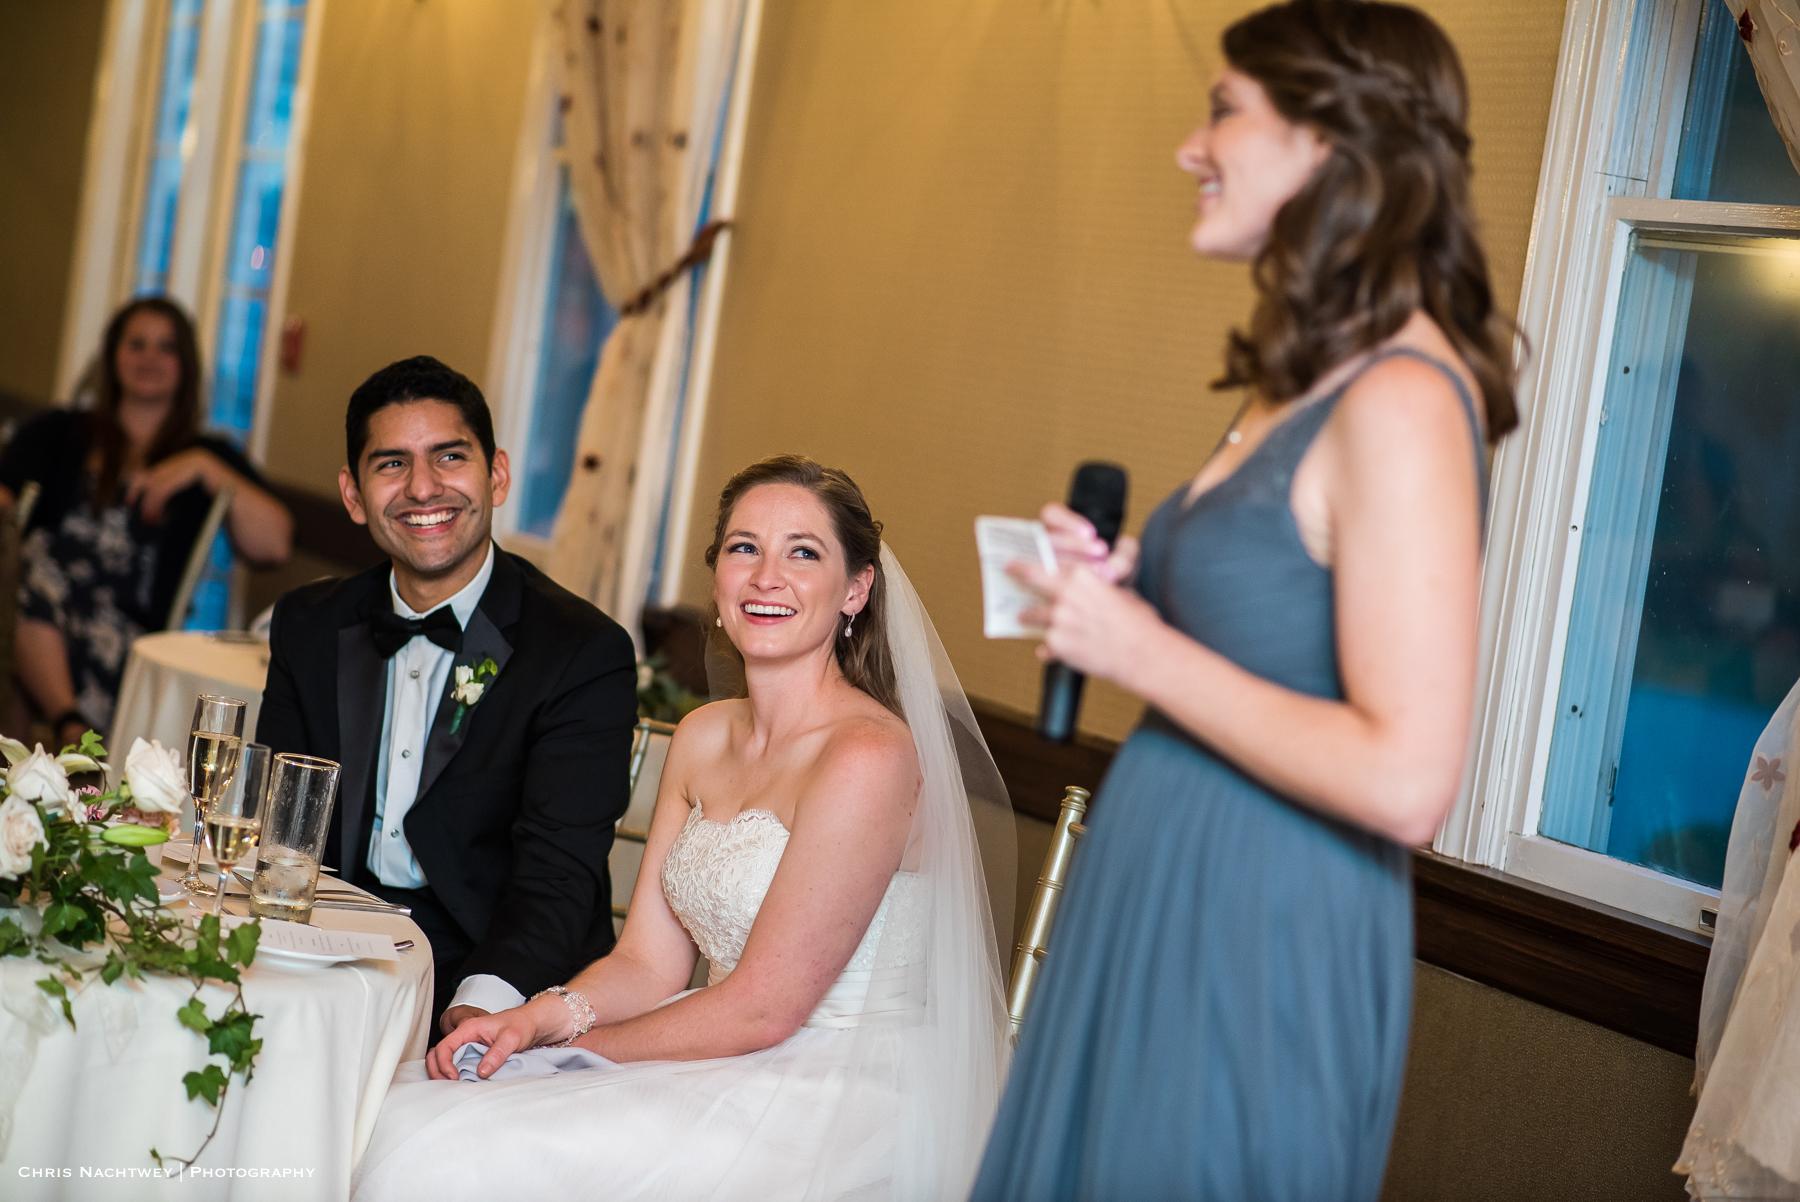 wedding-the-litchfield-inn-ct-photos-chris-nachtwey-photography-2018-54.jpg